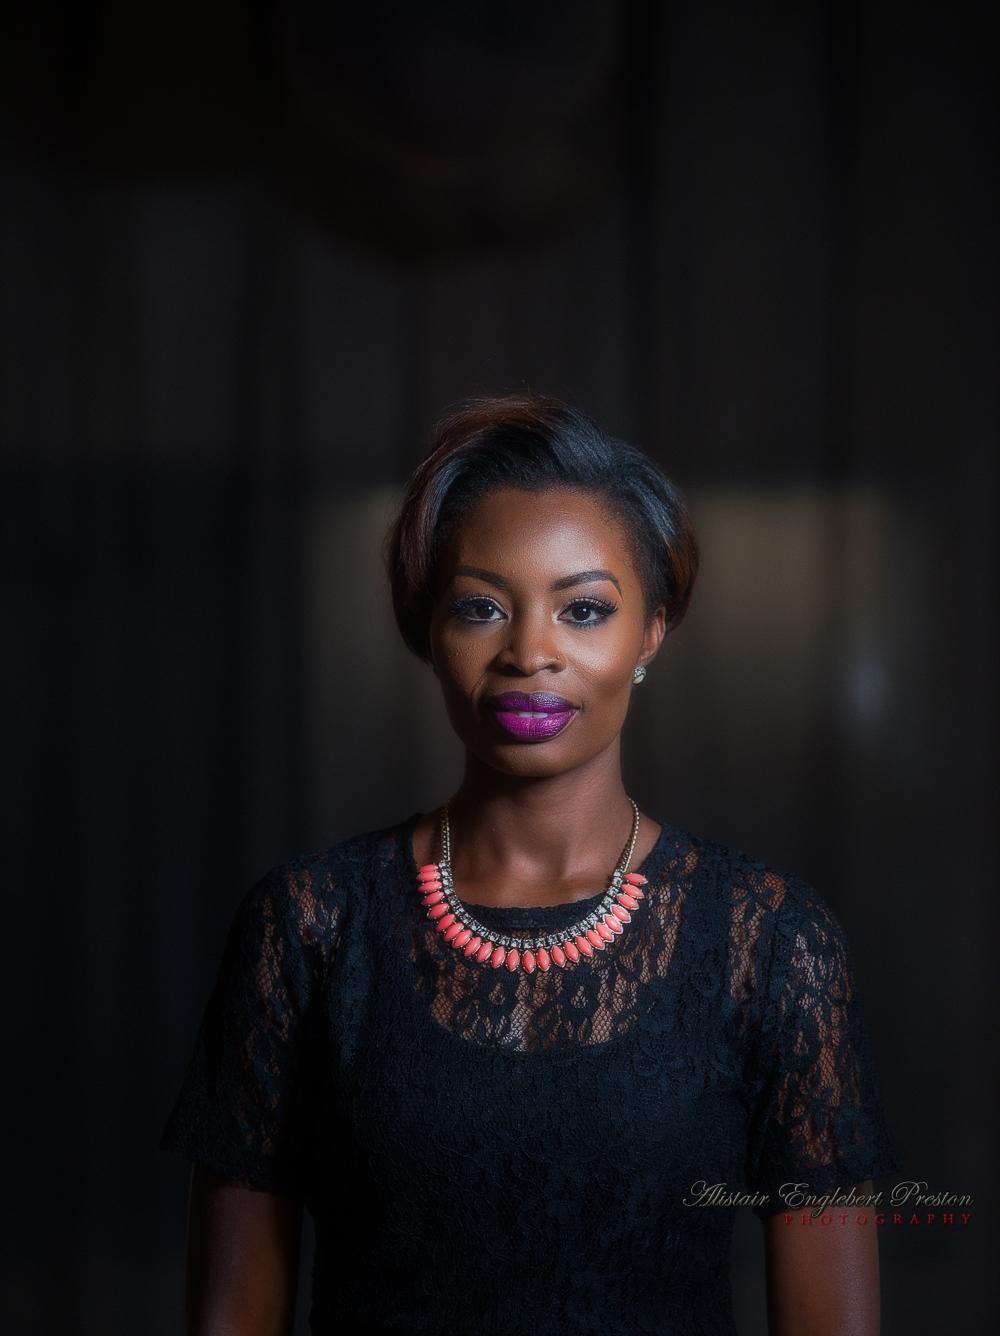 Outfit: Iconola  Photo: AEP Photography  Makeup: Tonikemi  Location: The Social Place, Sinari Daranijo St, Victoria Island, Lagos.